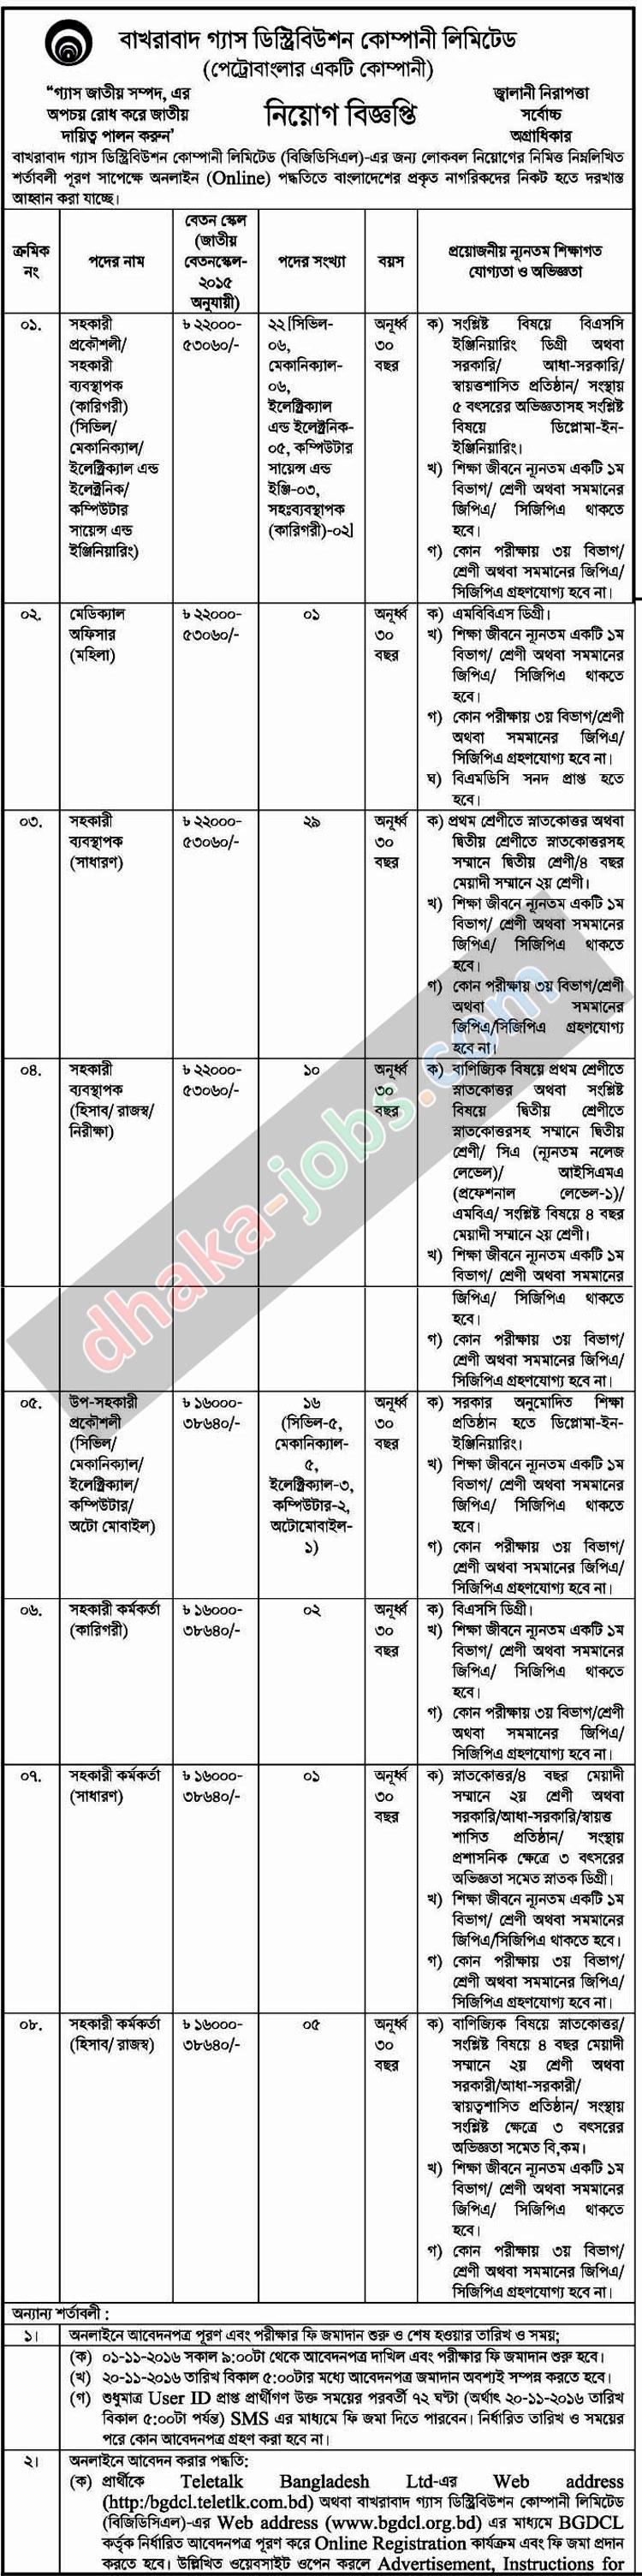 Bakhrabad Gas Distribution Company Job Circular 2016